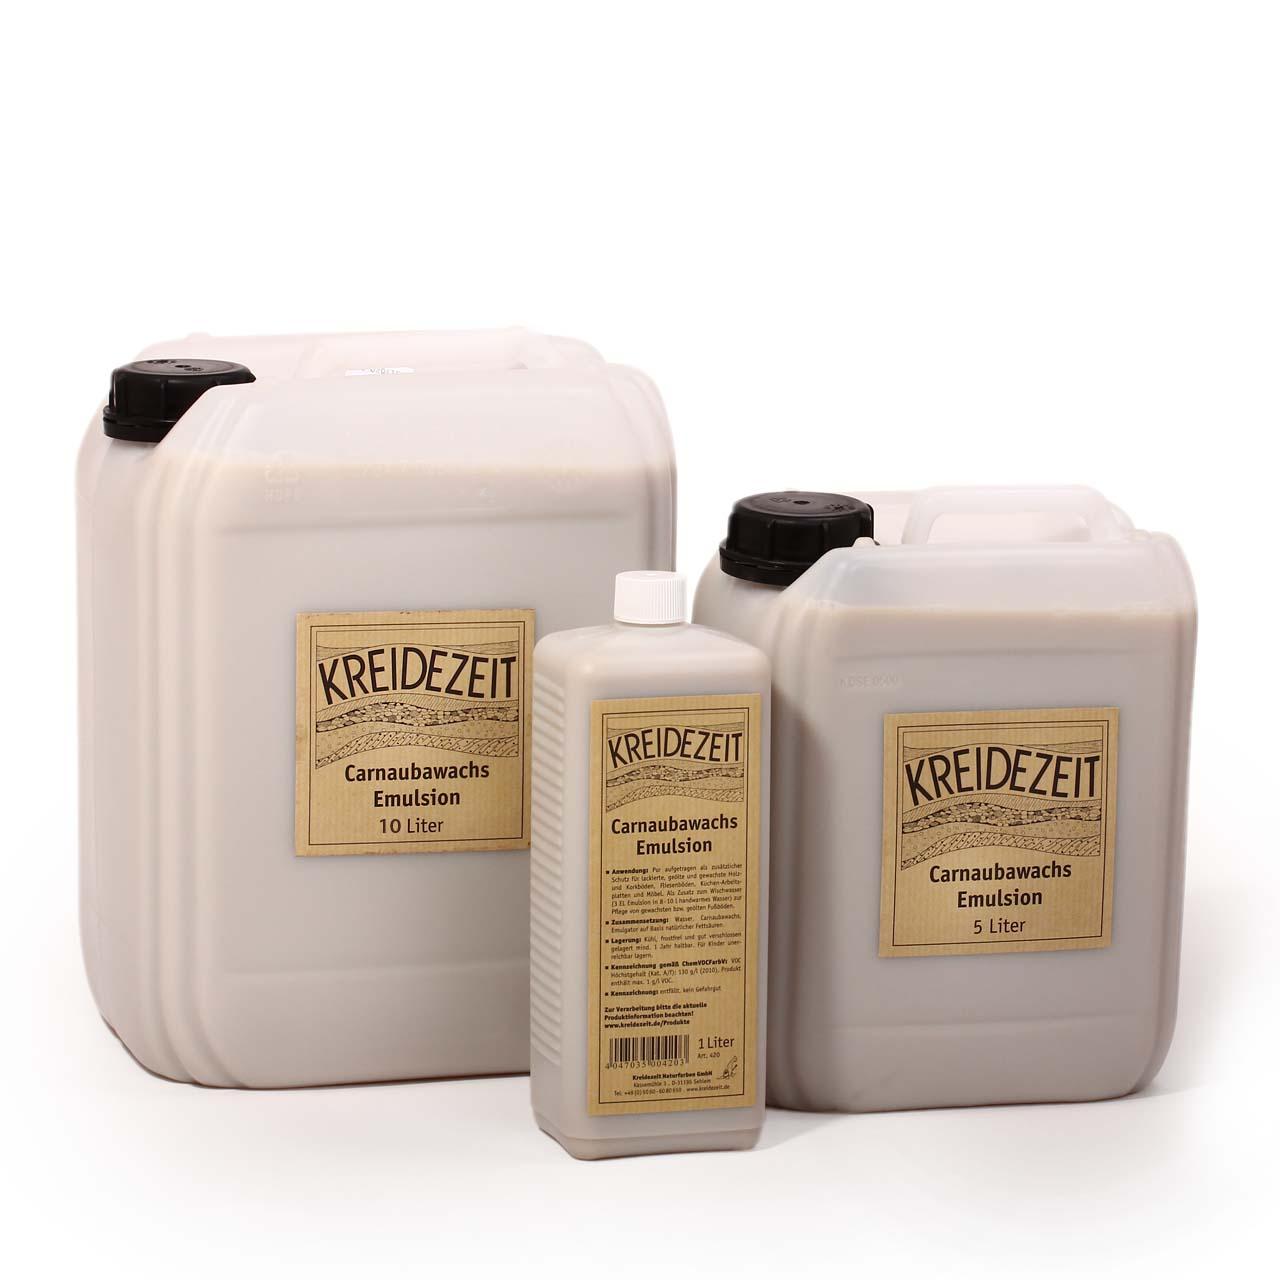 KREIDEZEIT Carnaubawachs Emulsion